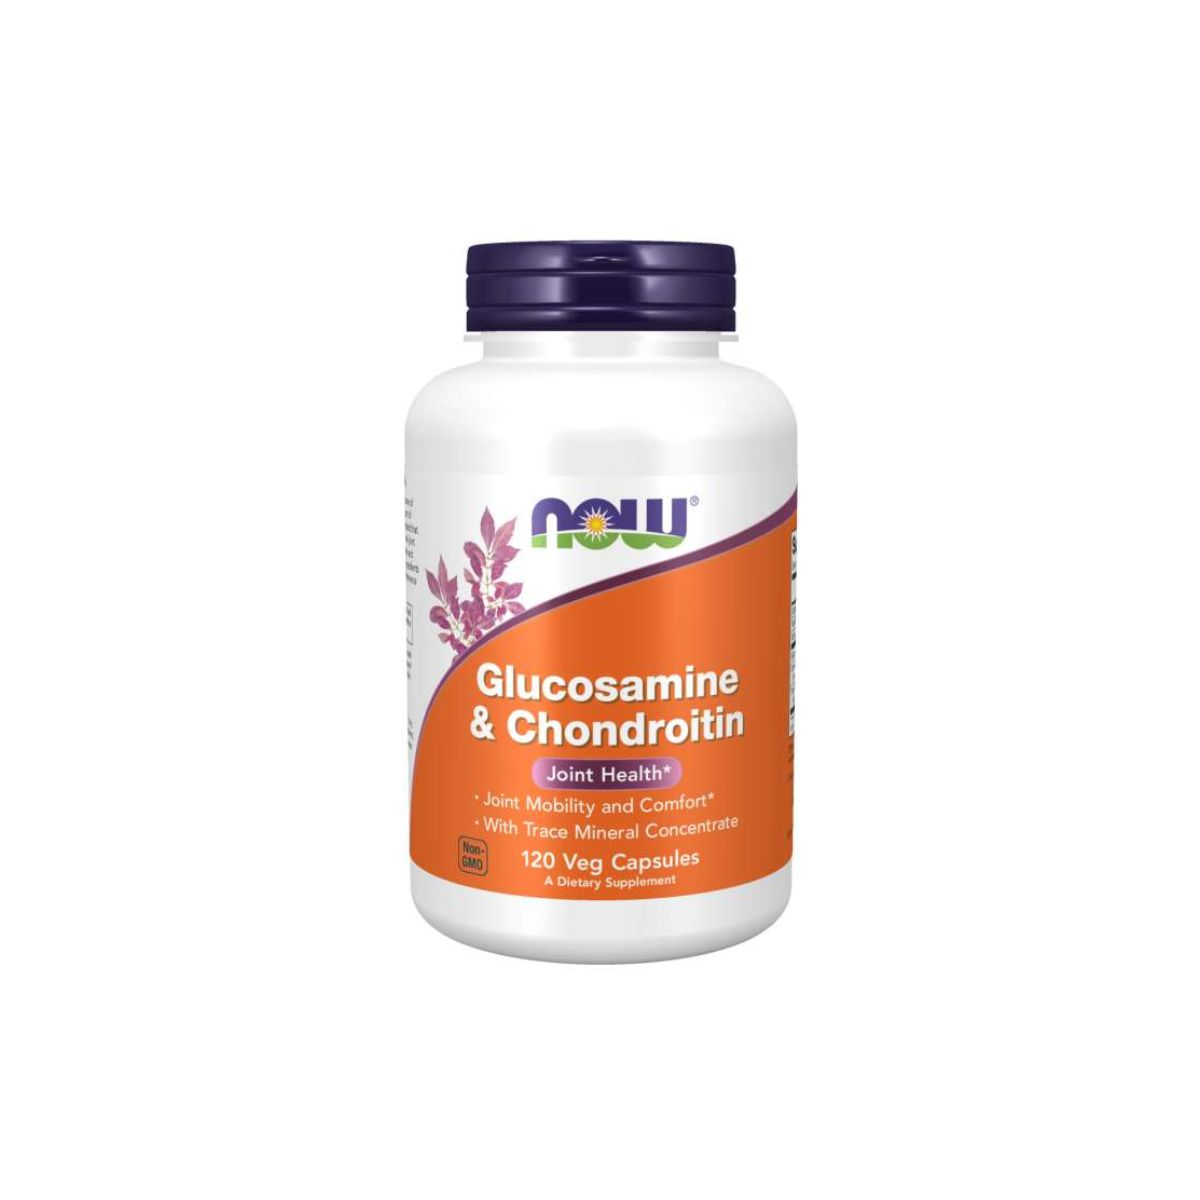 Glucosamine e Chondroitin 120 Caps - Now Foods